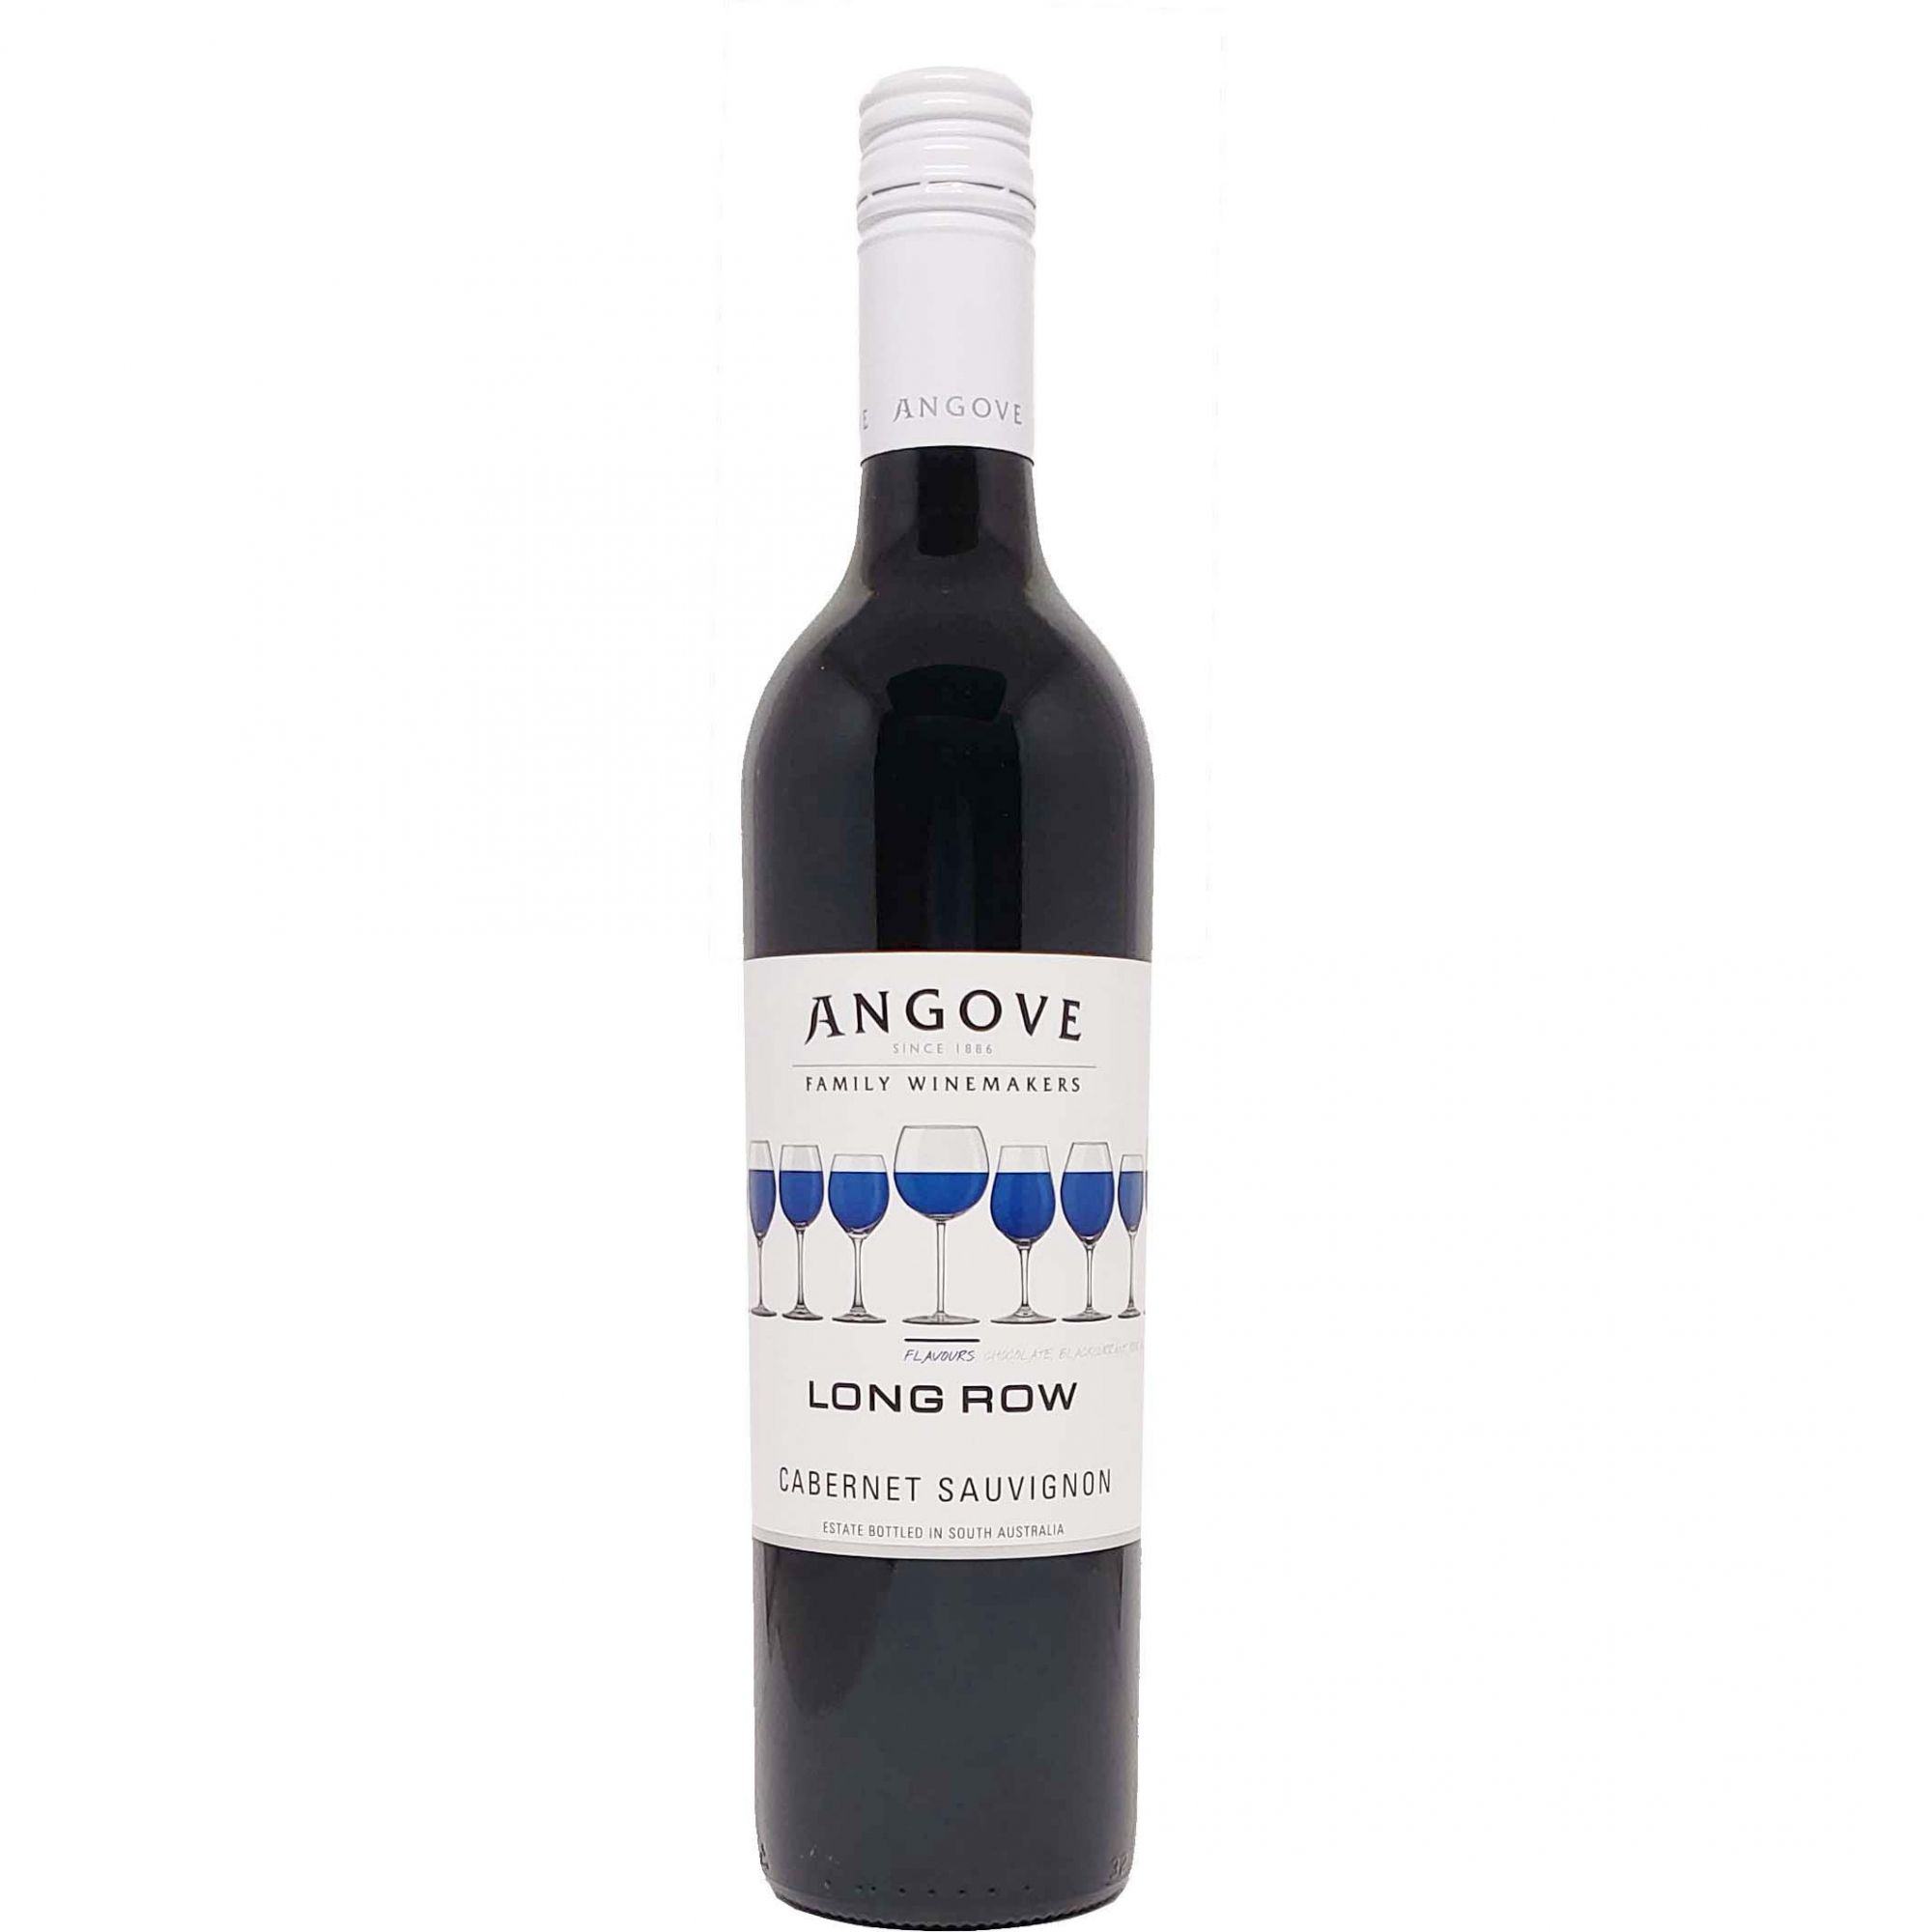 Vinho Tinto Long Row Angove Cabernet Sauvignon - 750ml -